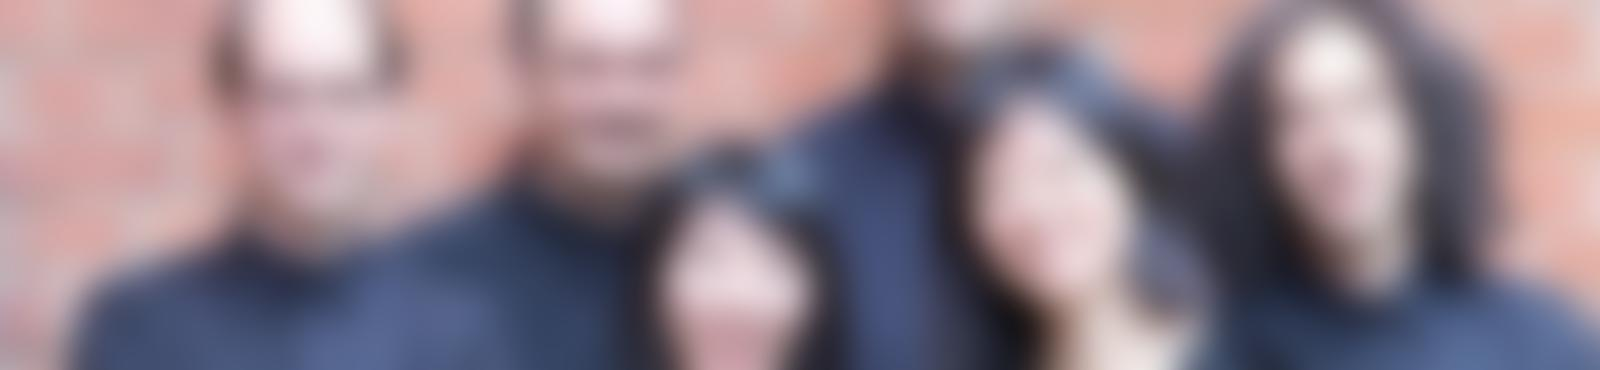 Blurred c506bbf0 4d55 4f3a 84e1 4a2fa32de507